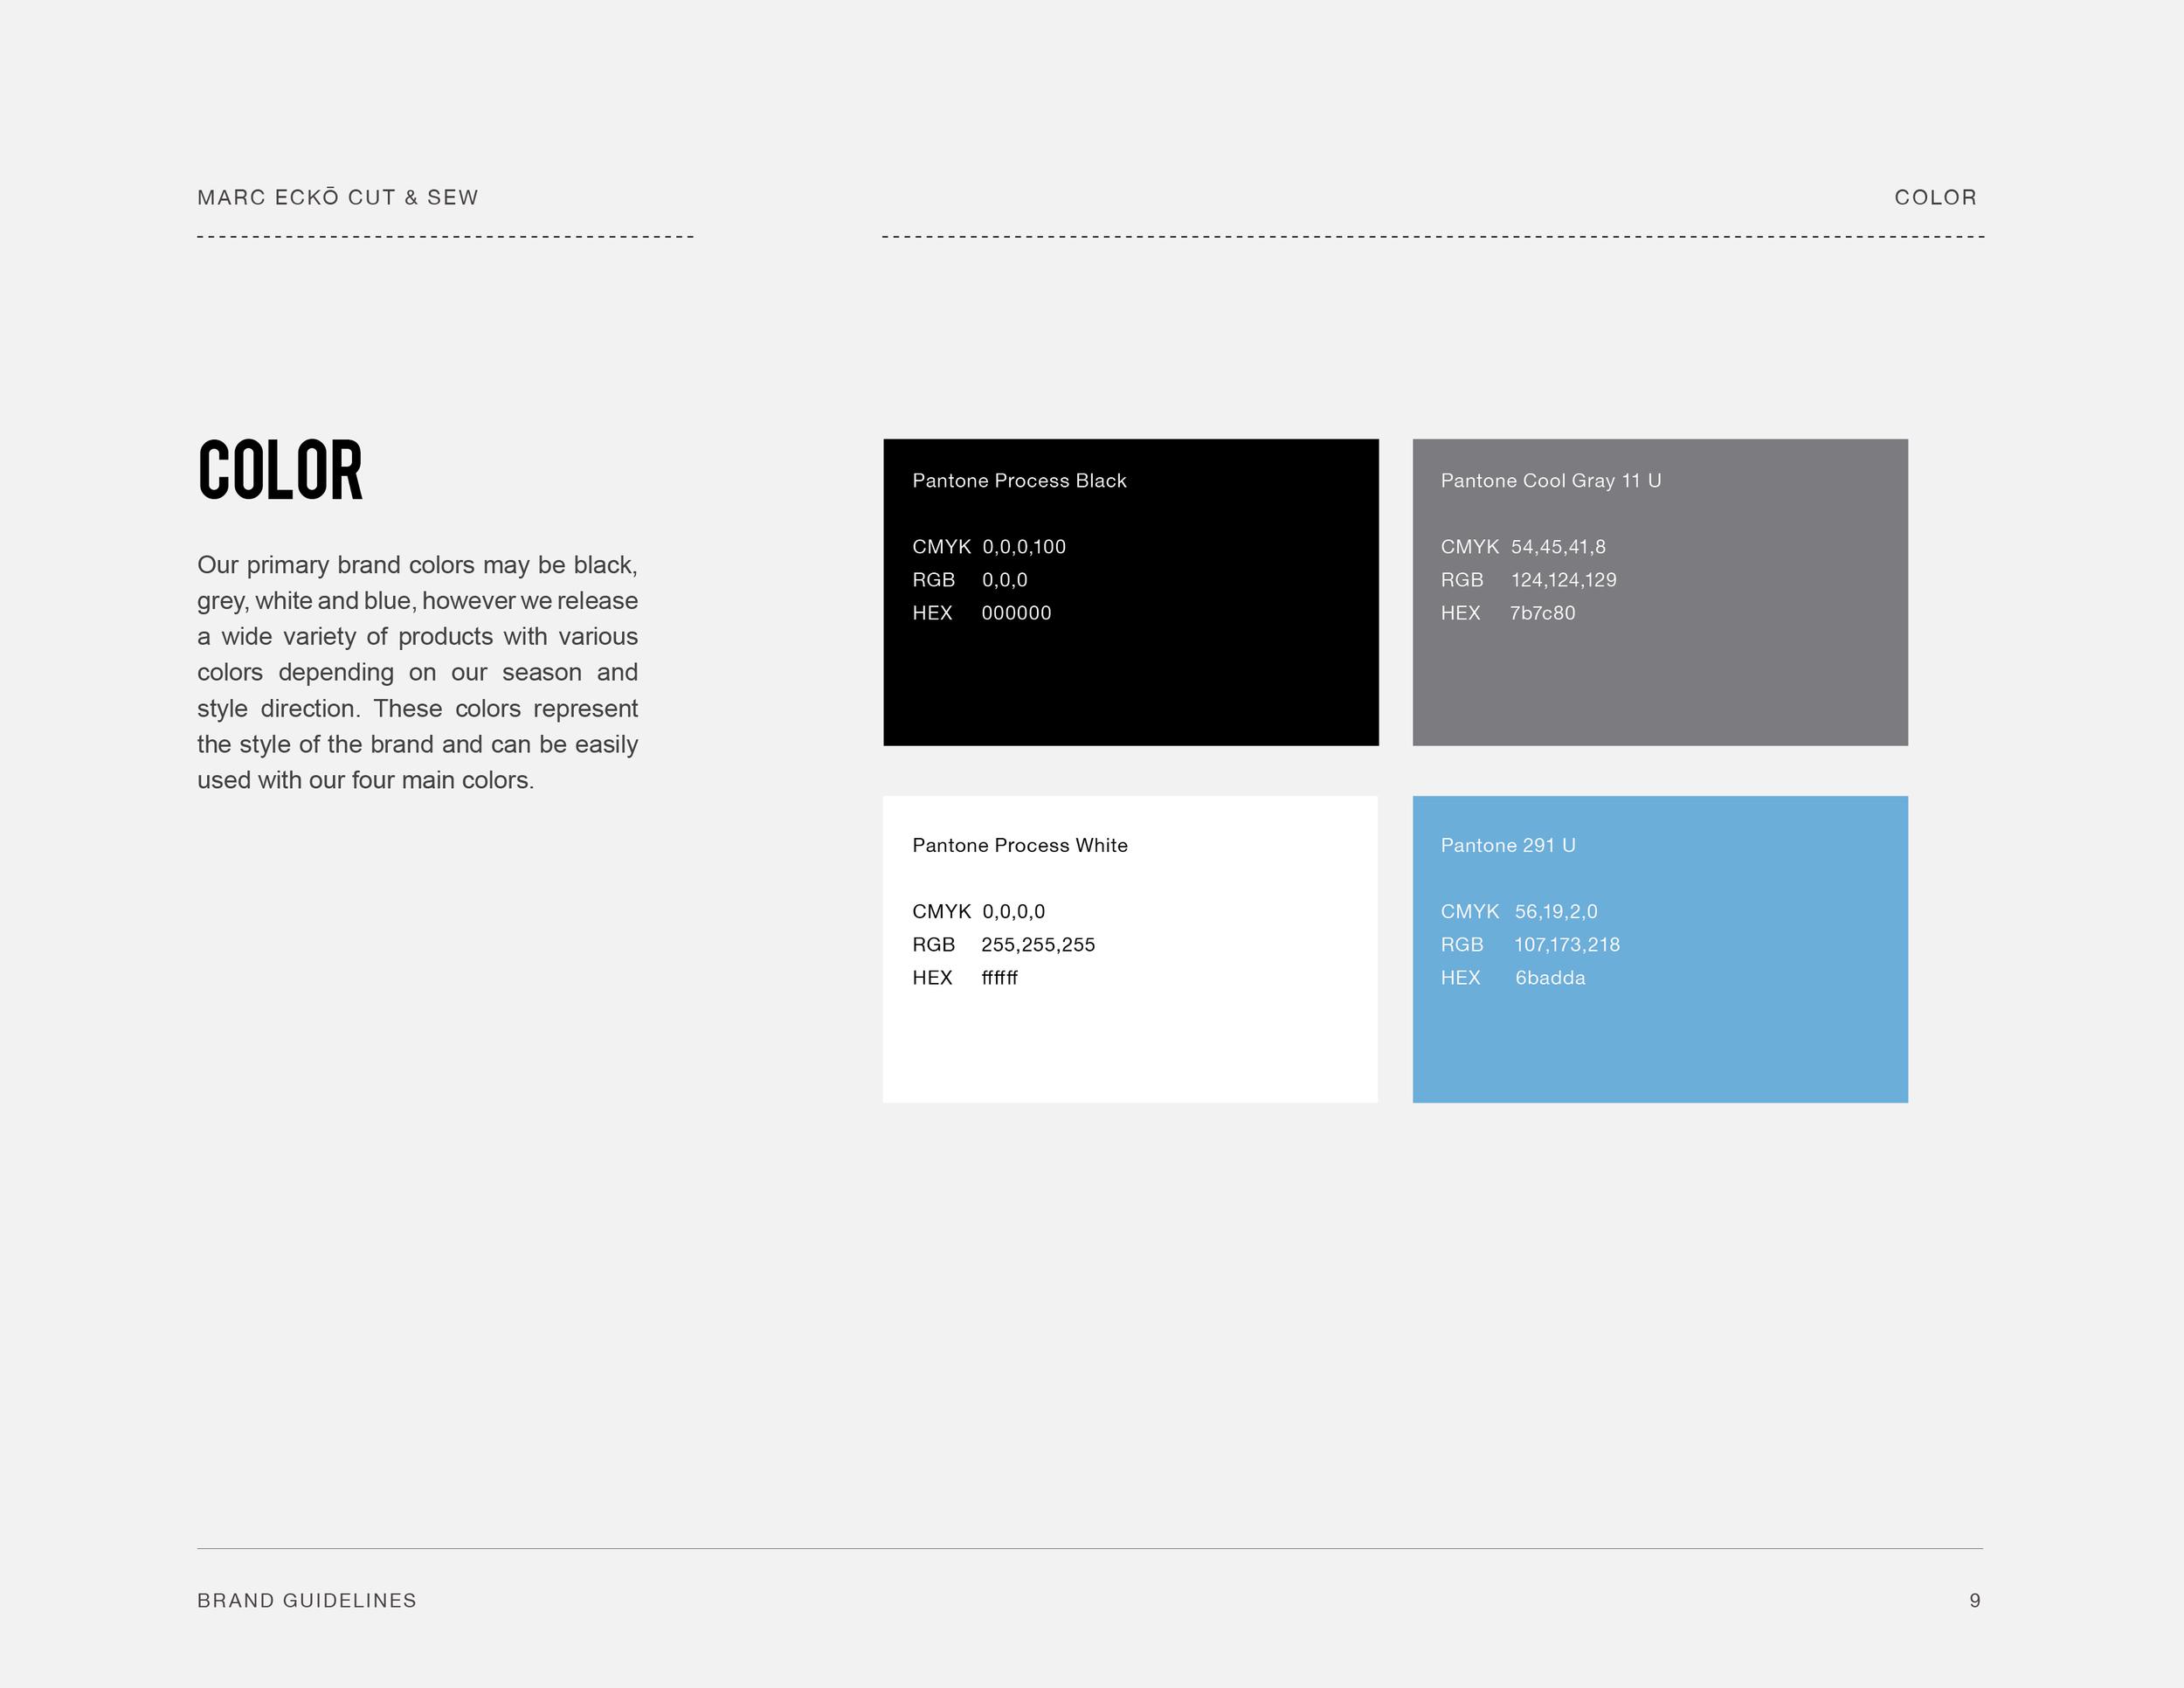 Marc-Ecko-brand-guidelines12.jpg